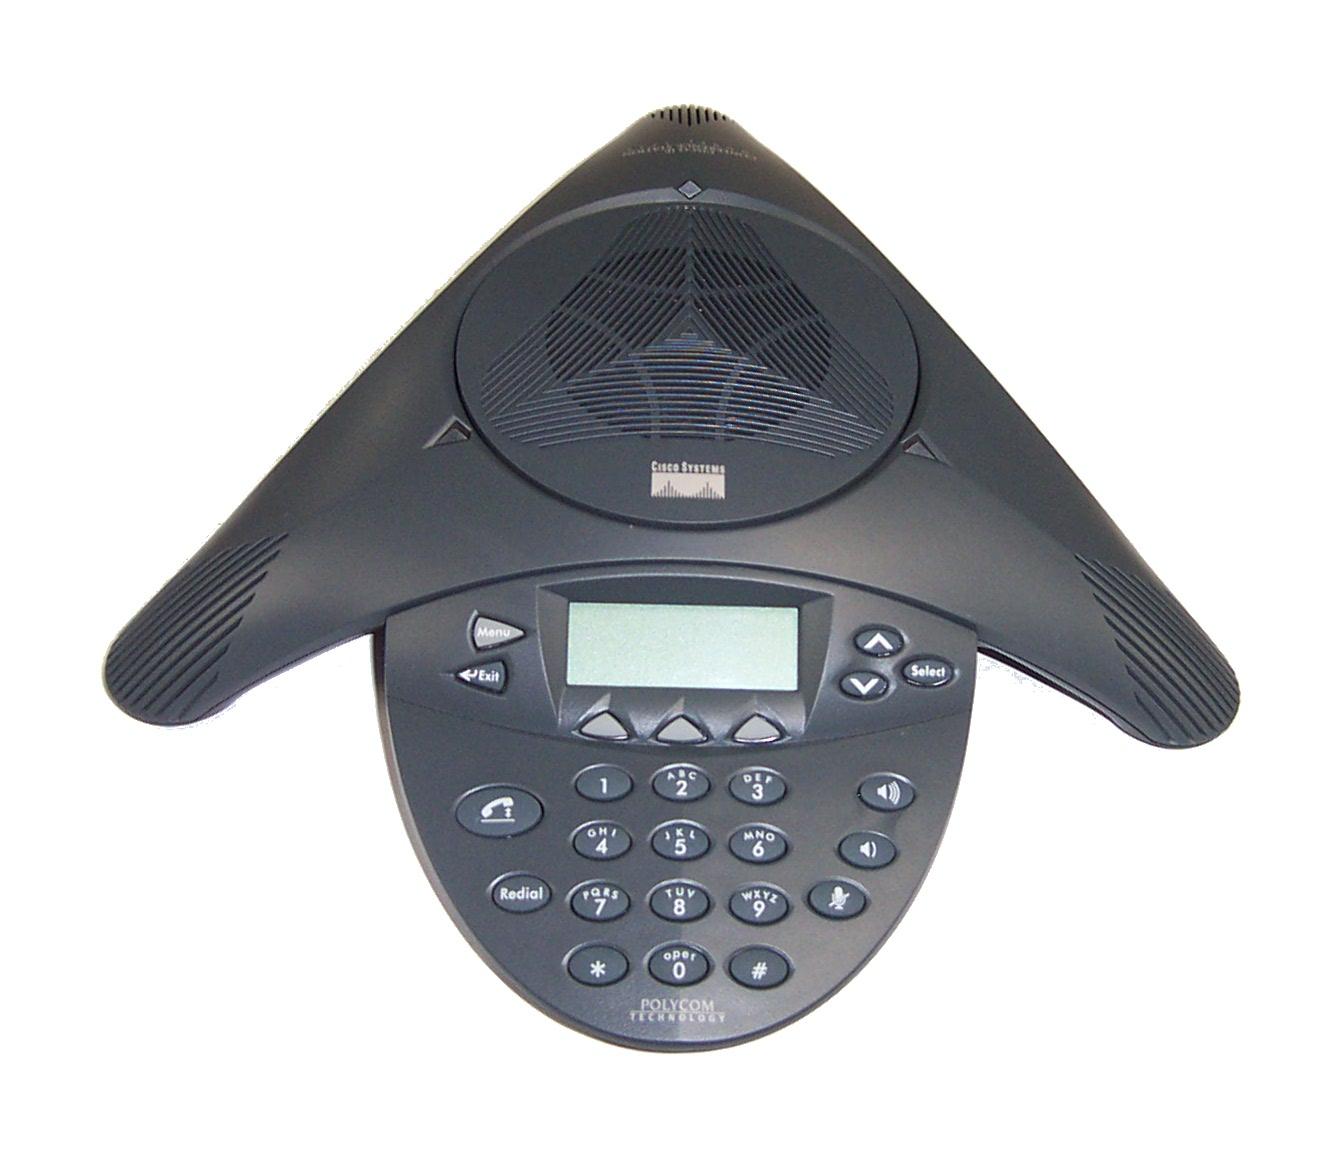 Cisco Phone Conference Microphones